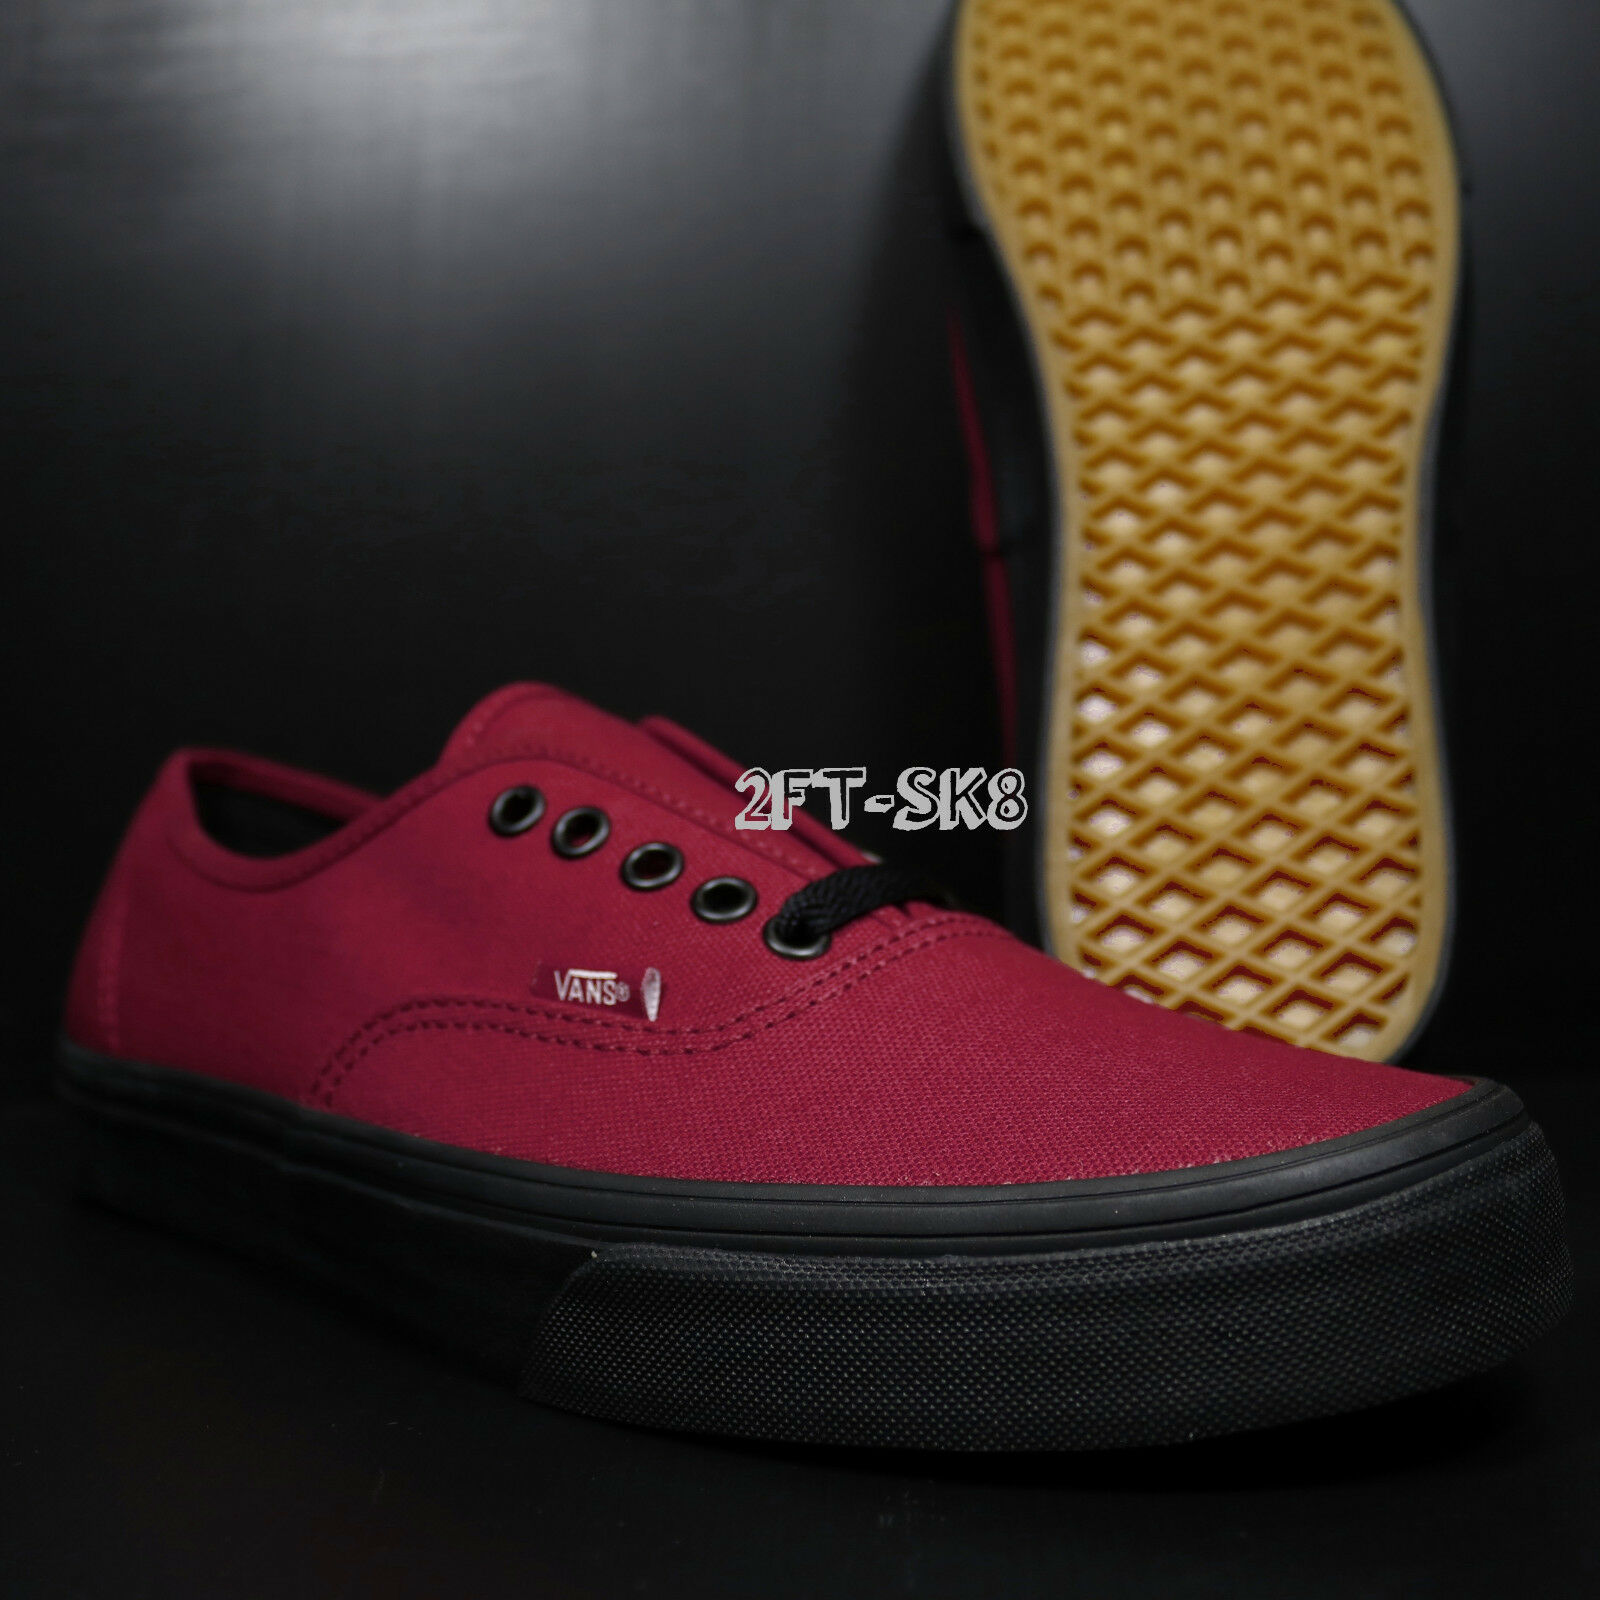 NEW VANS AUTHENTIC BLACK SOLE JESTER RED MEN'S SKATE SHOES SHOES SKATE /S89159.084 0f9d9a